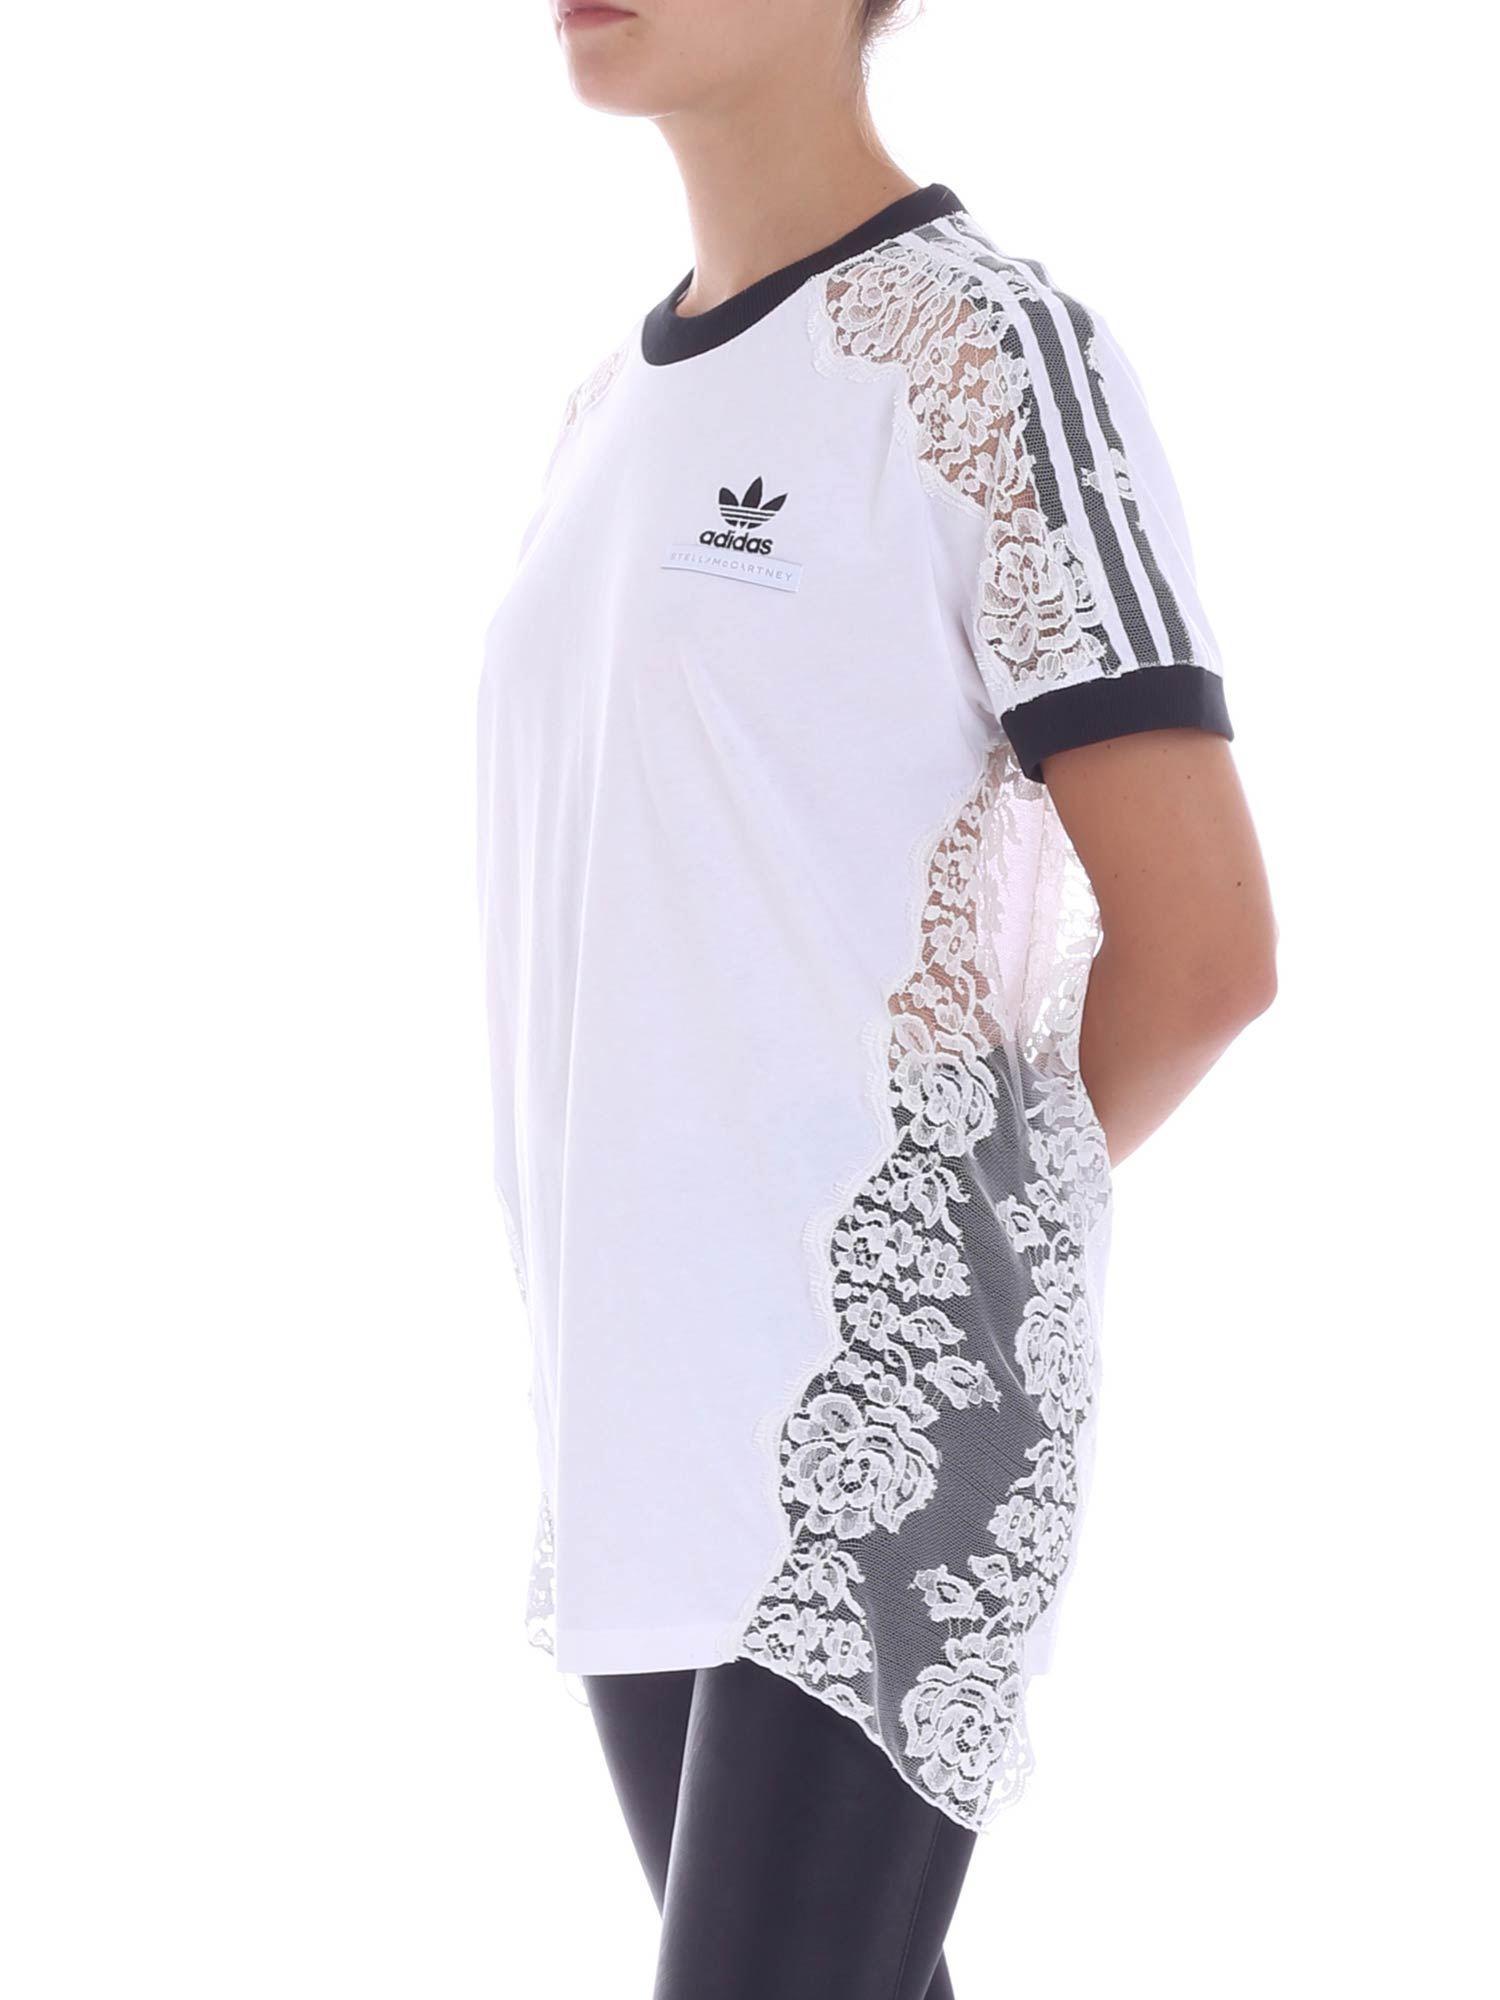 f07f511079849 Stella McCartney X Adidas Lace Trim Tee in White - Save 47% - Lyst